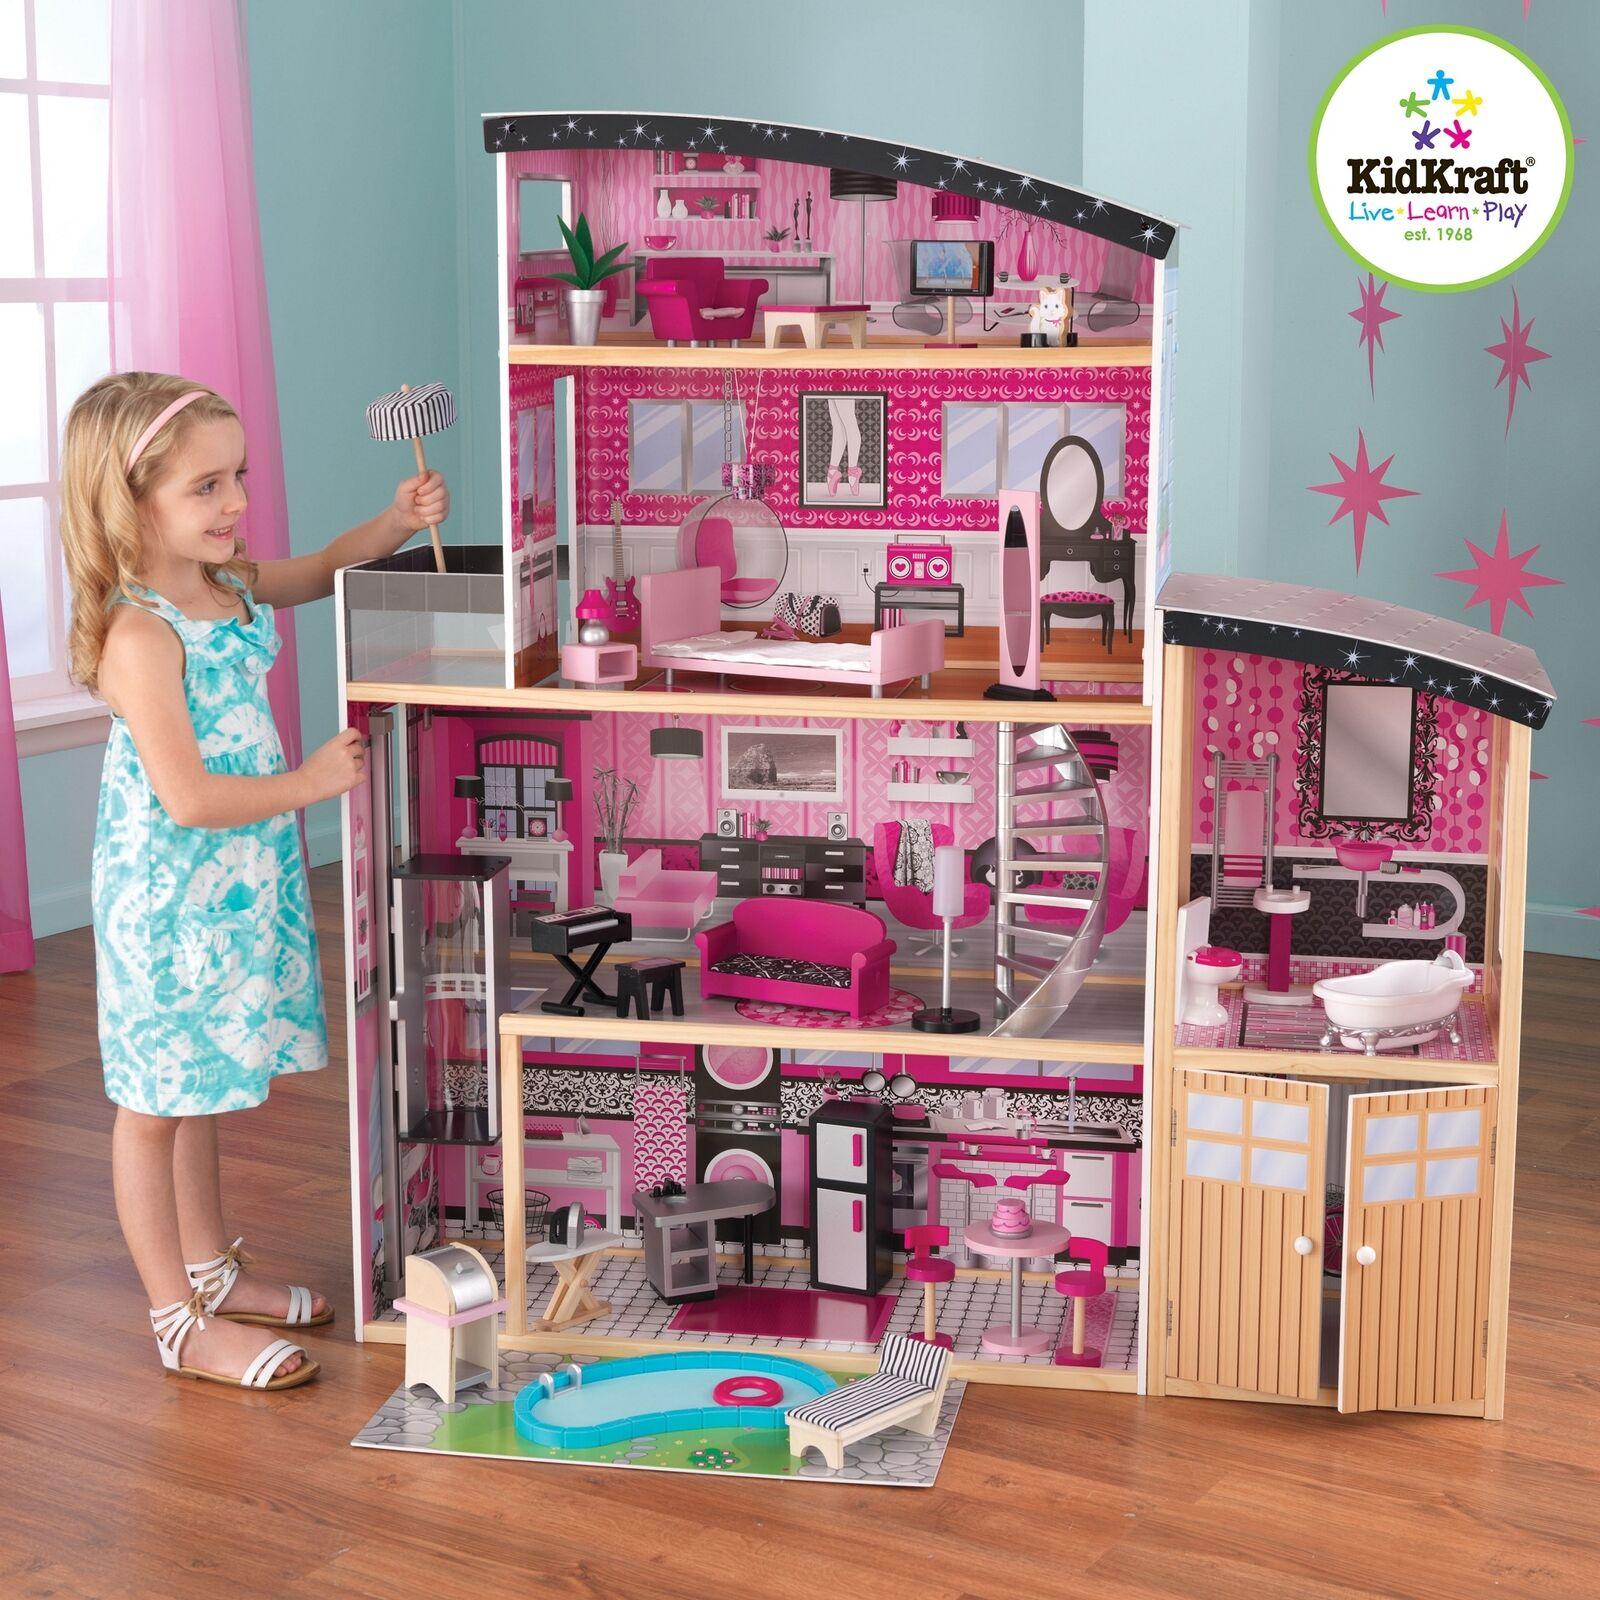 Kidkraft Sparkle Sparkle Sparkle Mansion Dollhouse Large Girls Woode Dolls House e62c11